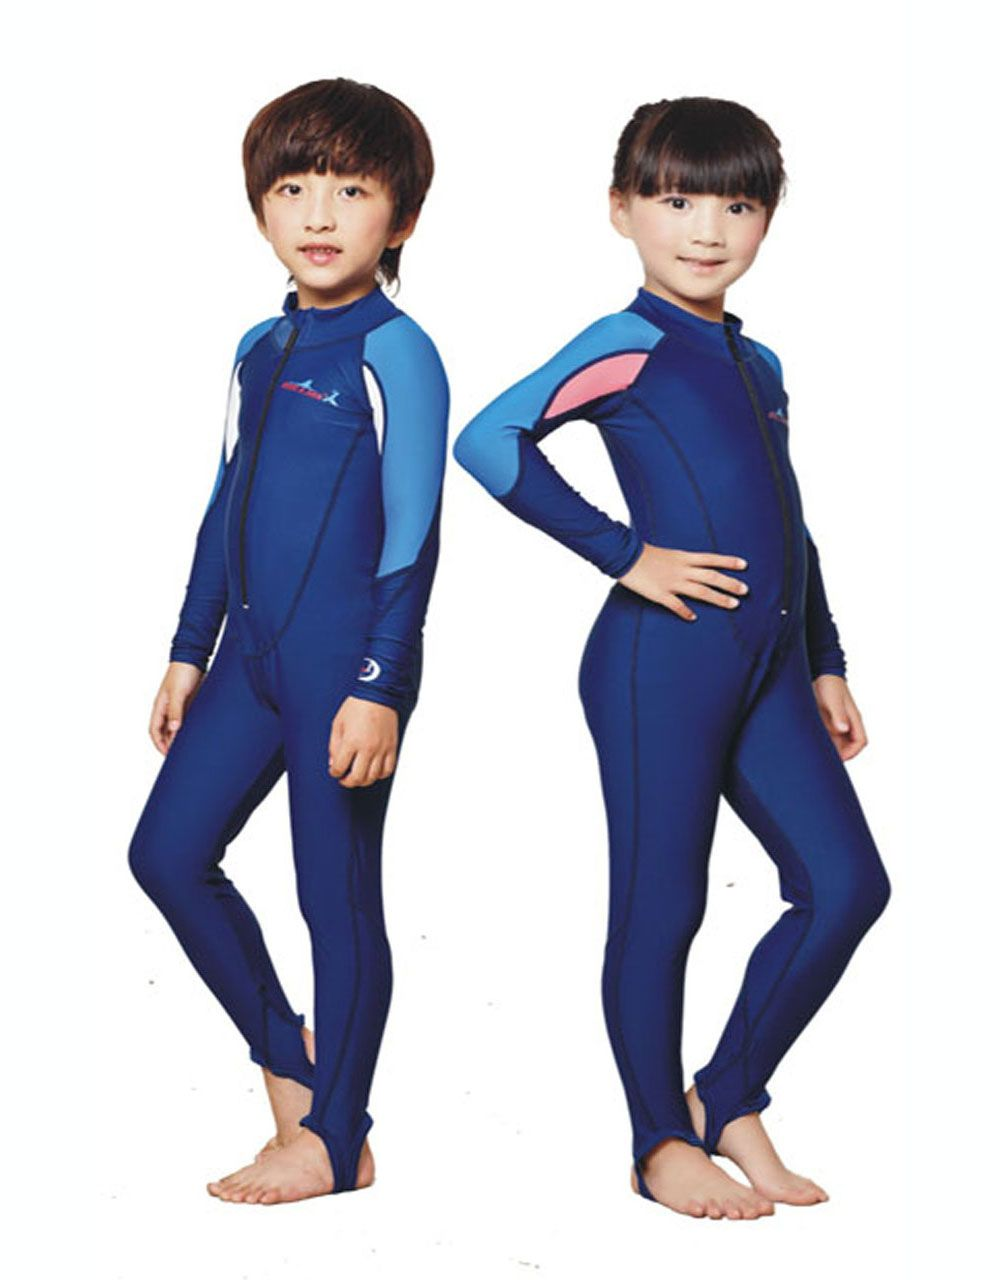 a026243def7 Kids Swim Suit Youth Basic Skins Long Sleeve Jumpsuit Crew Rash Guard Shirt…